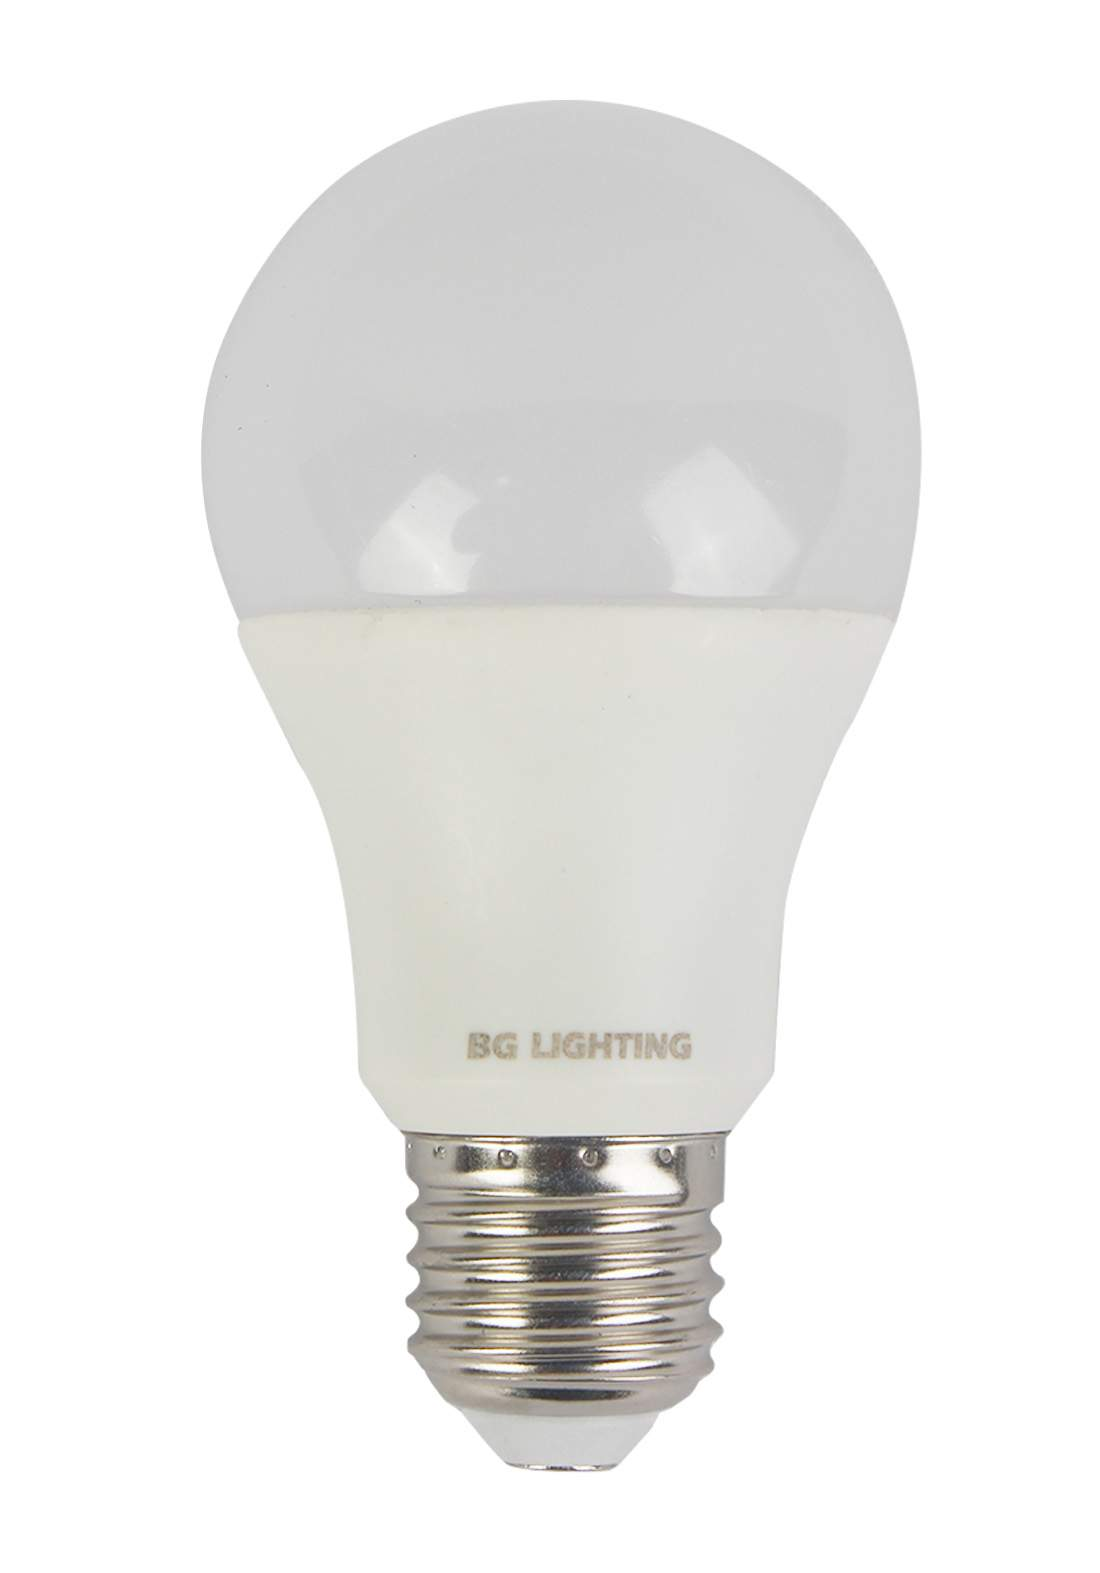 Bg BA27C9W81 led 9W مصباح ليد